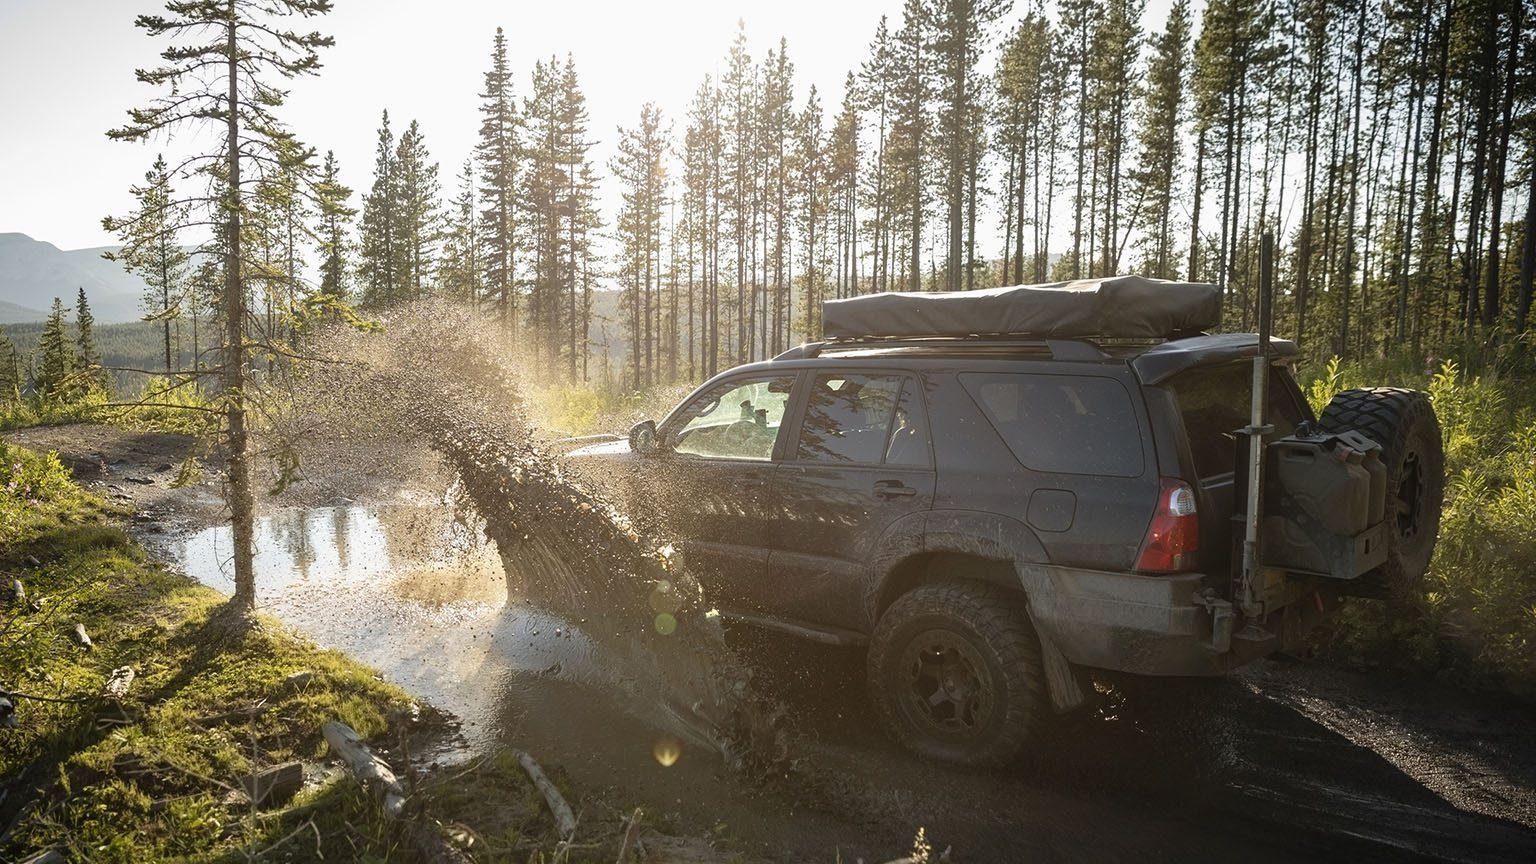 SUV splashing through mud